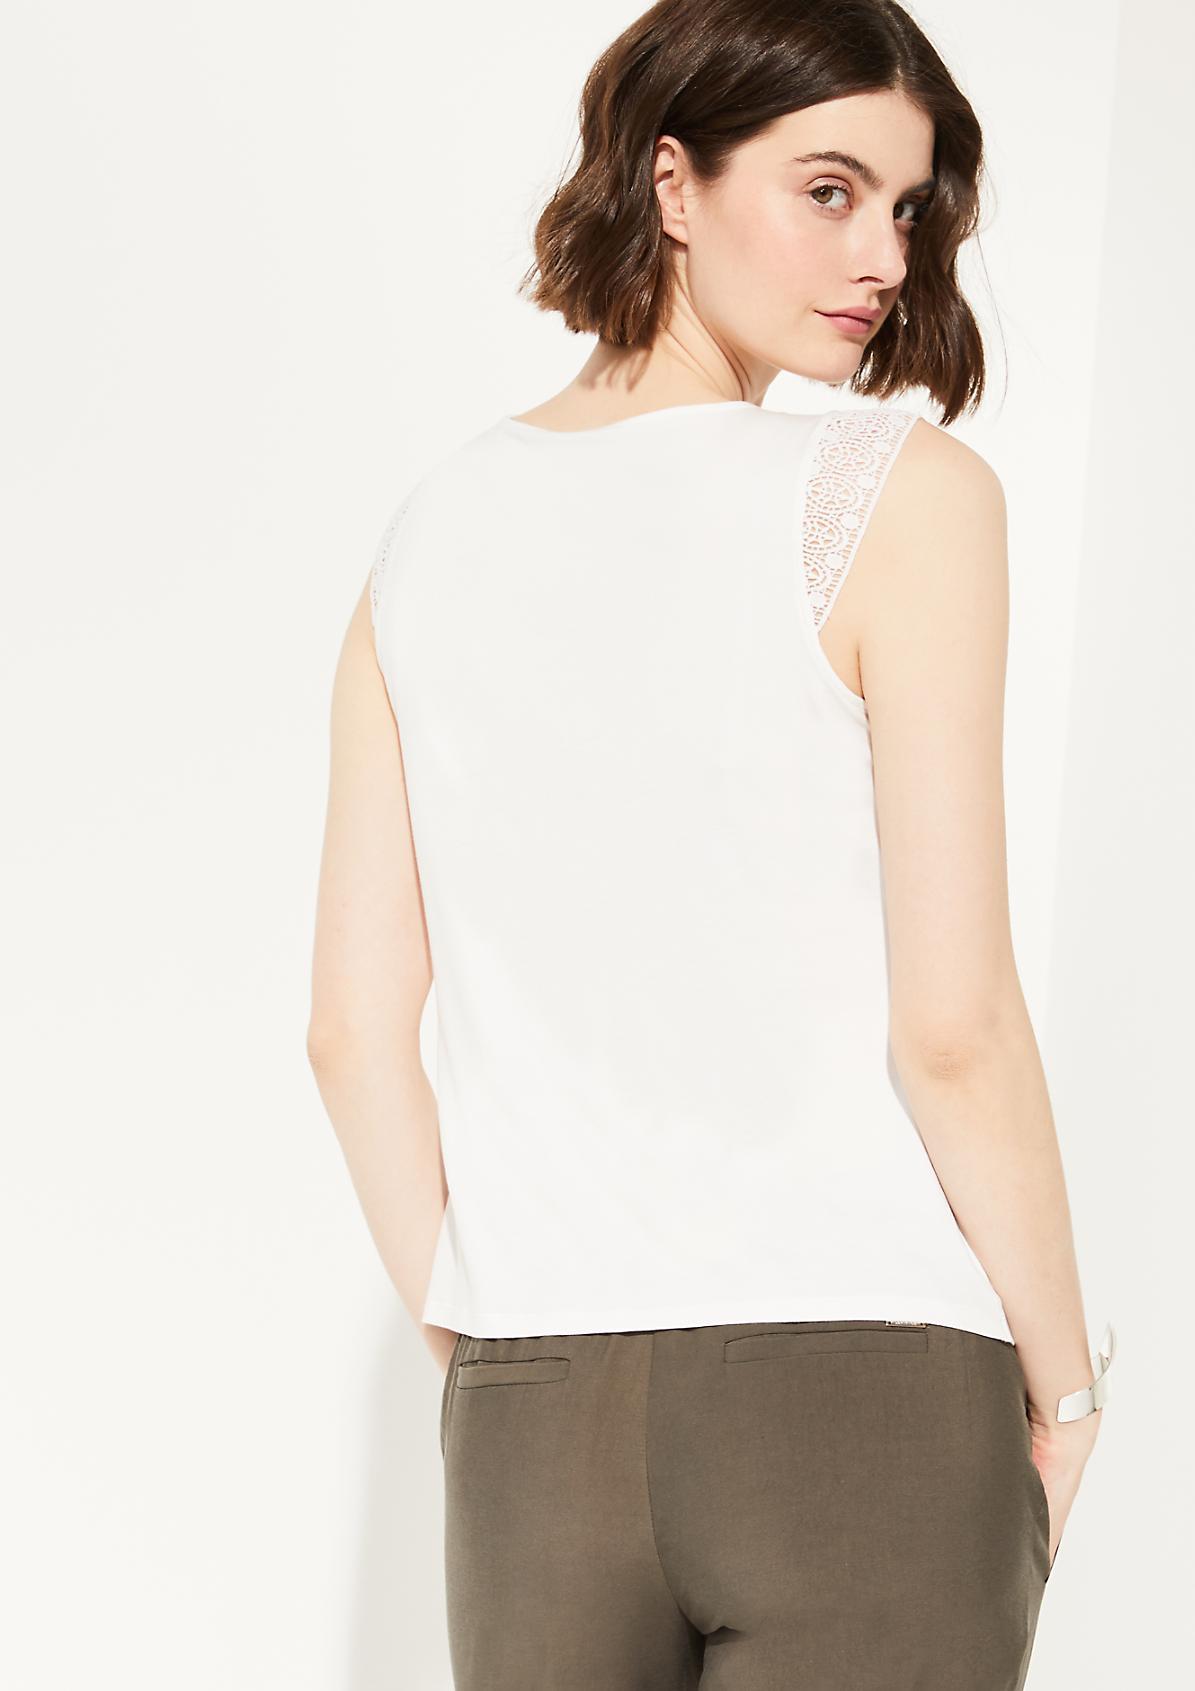 Materialmix-Shirt mit Häkelspitze